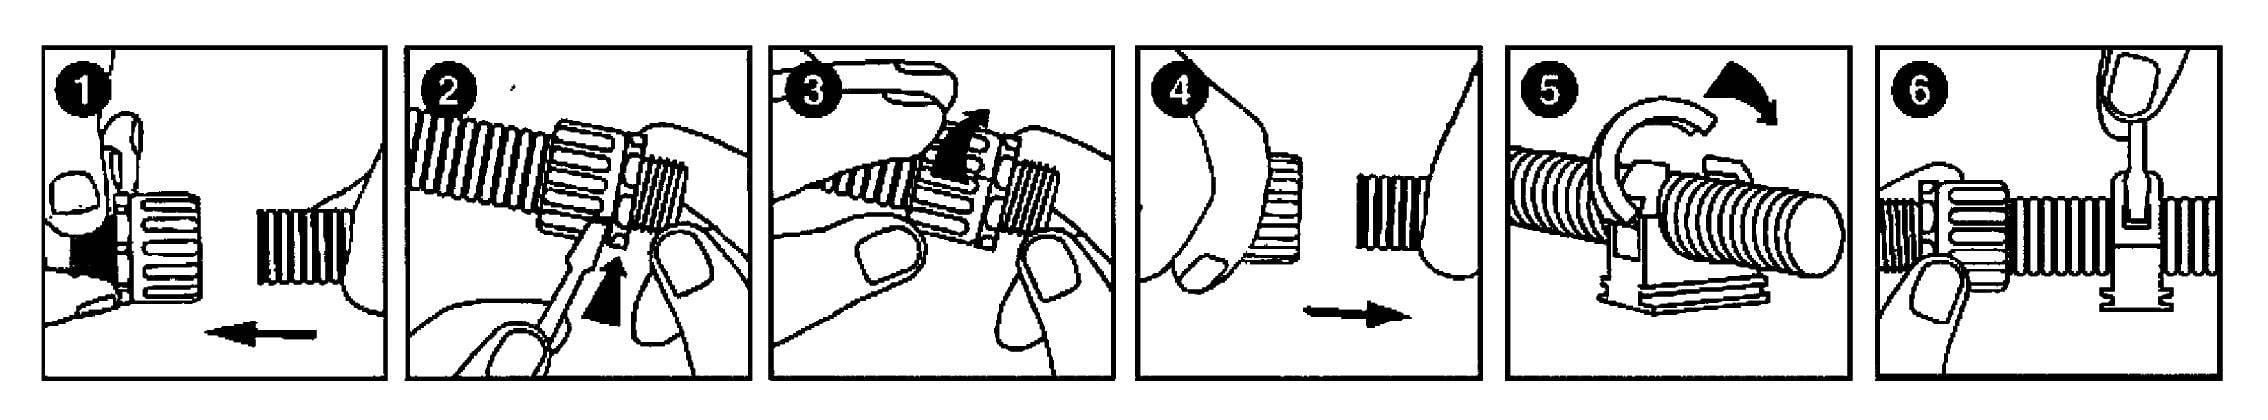 Vlnitá trubka LappKabel SILVYN® FPAS 18/14,2x18,5 BK 61754275, 14.20 mm, černá, 10 m